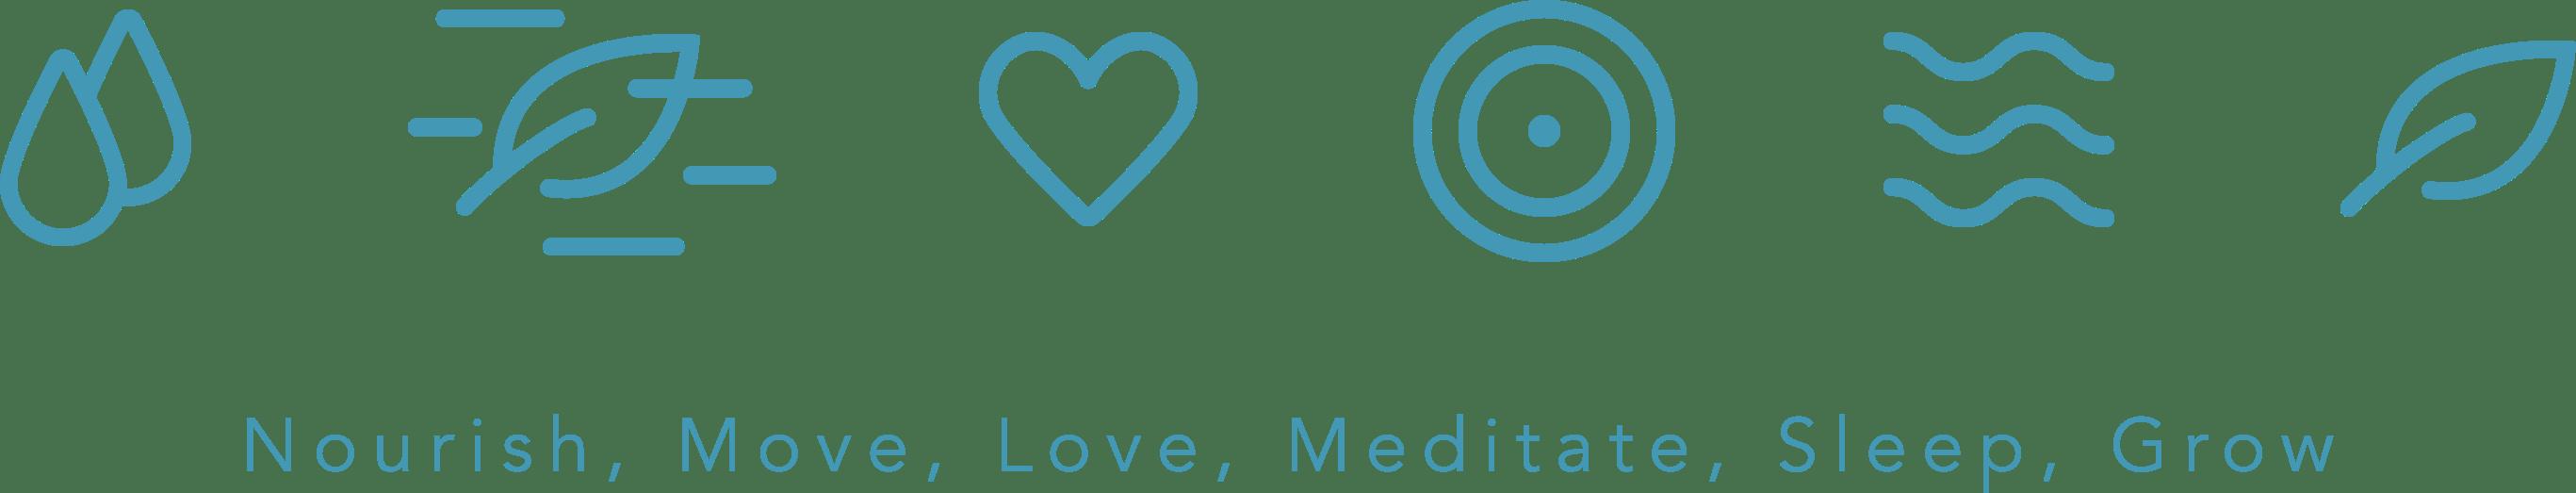 Nourish, Move, Love, Meditate, Sleep, Grow